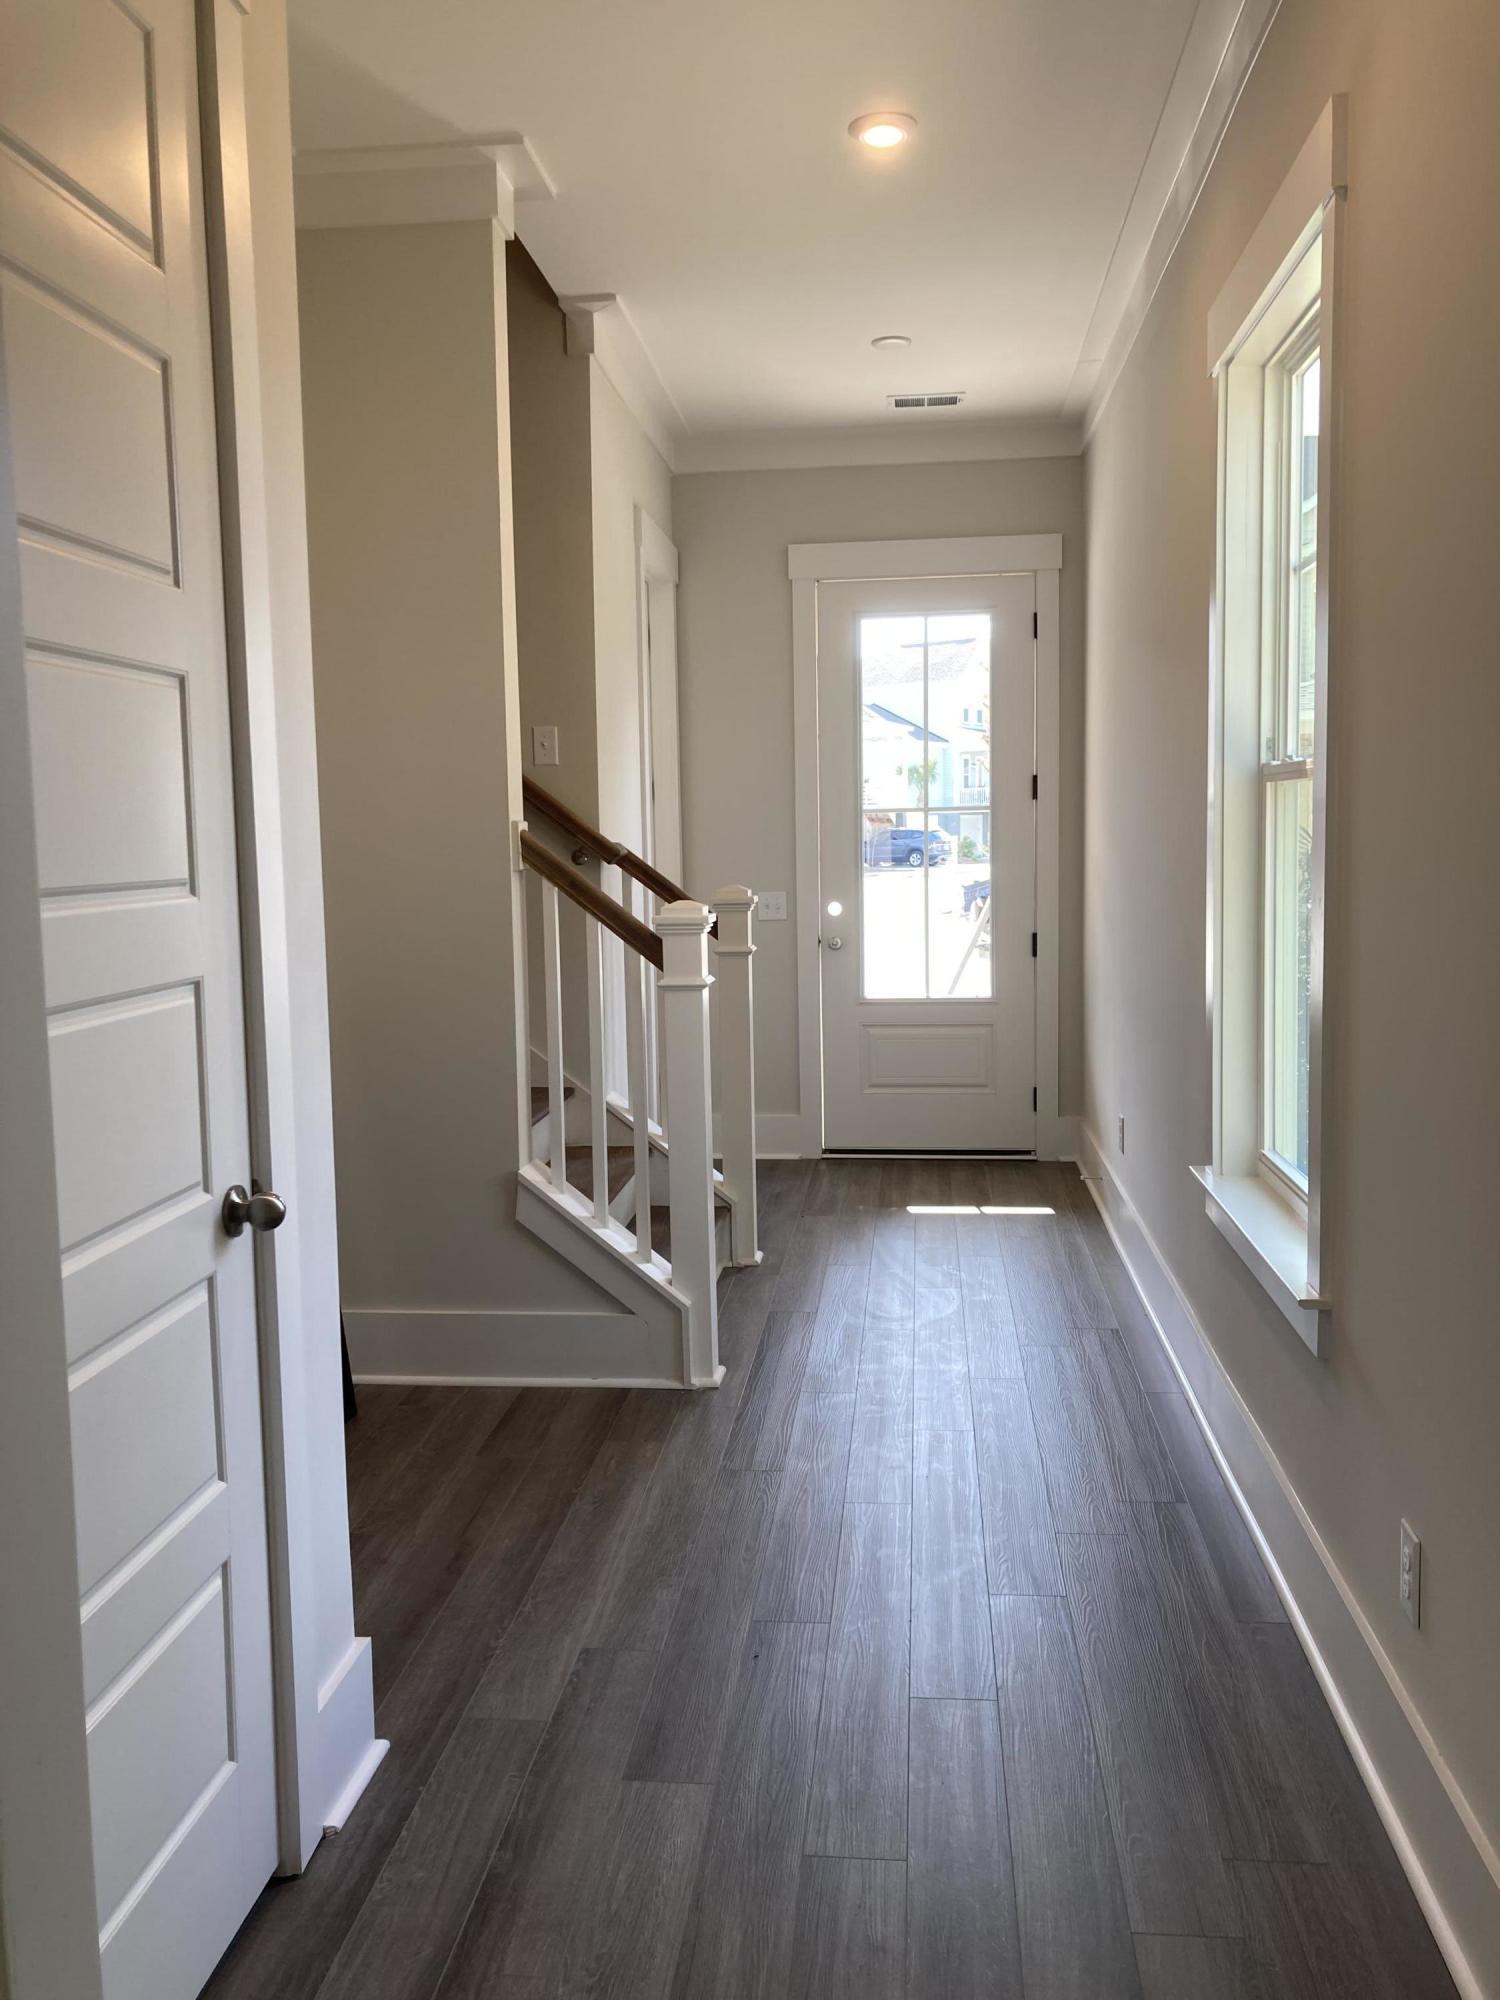 Fulton Park Homes For Sale - 1260 Max, Mount Pleasant, SC - 9